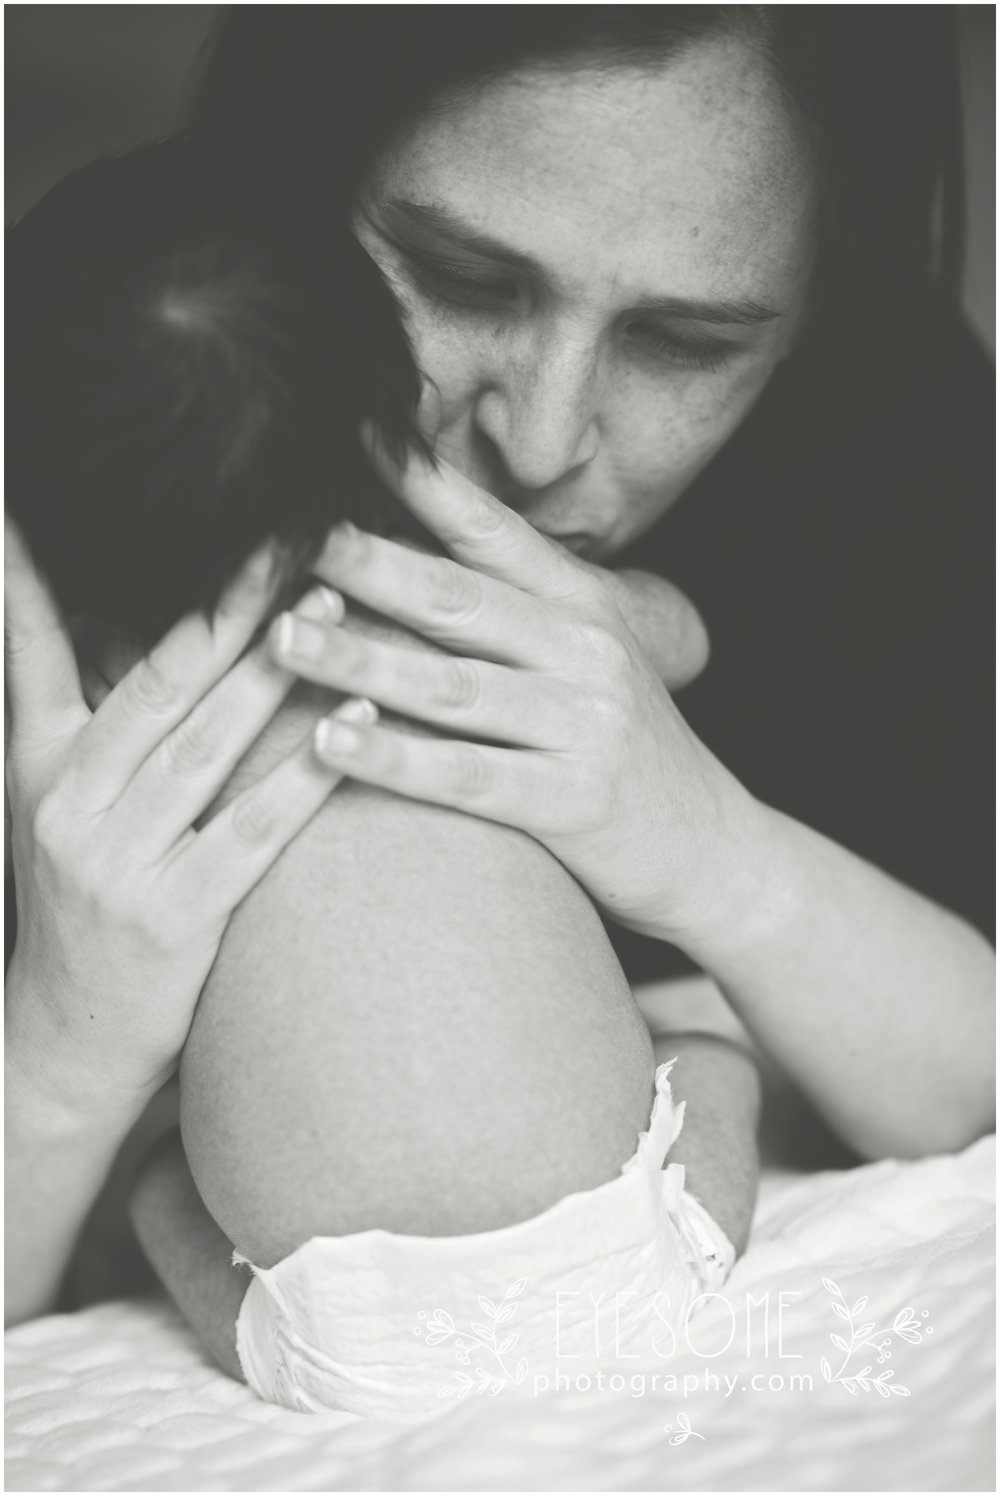 DSC_0185_harrogate newborn photographs.jpg